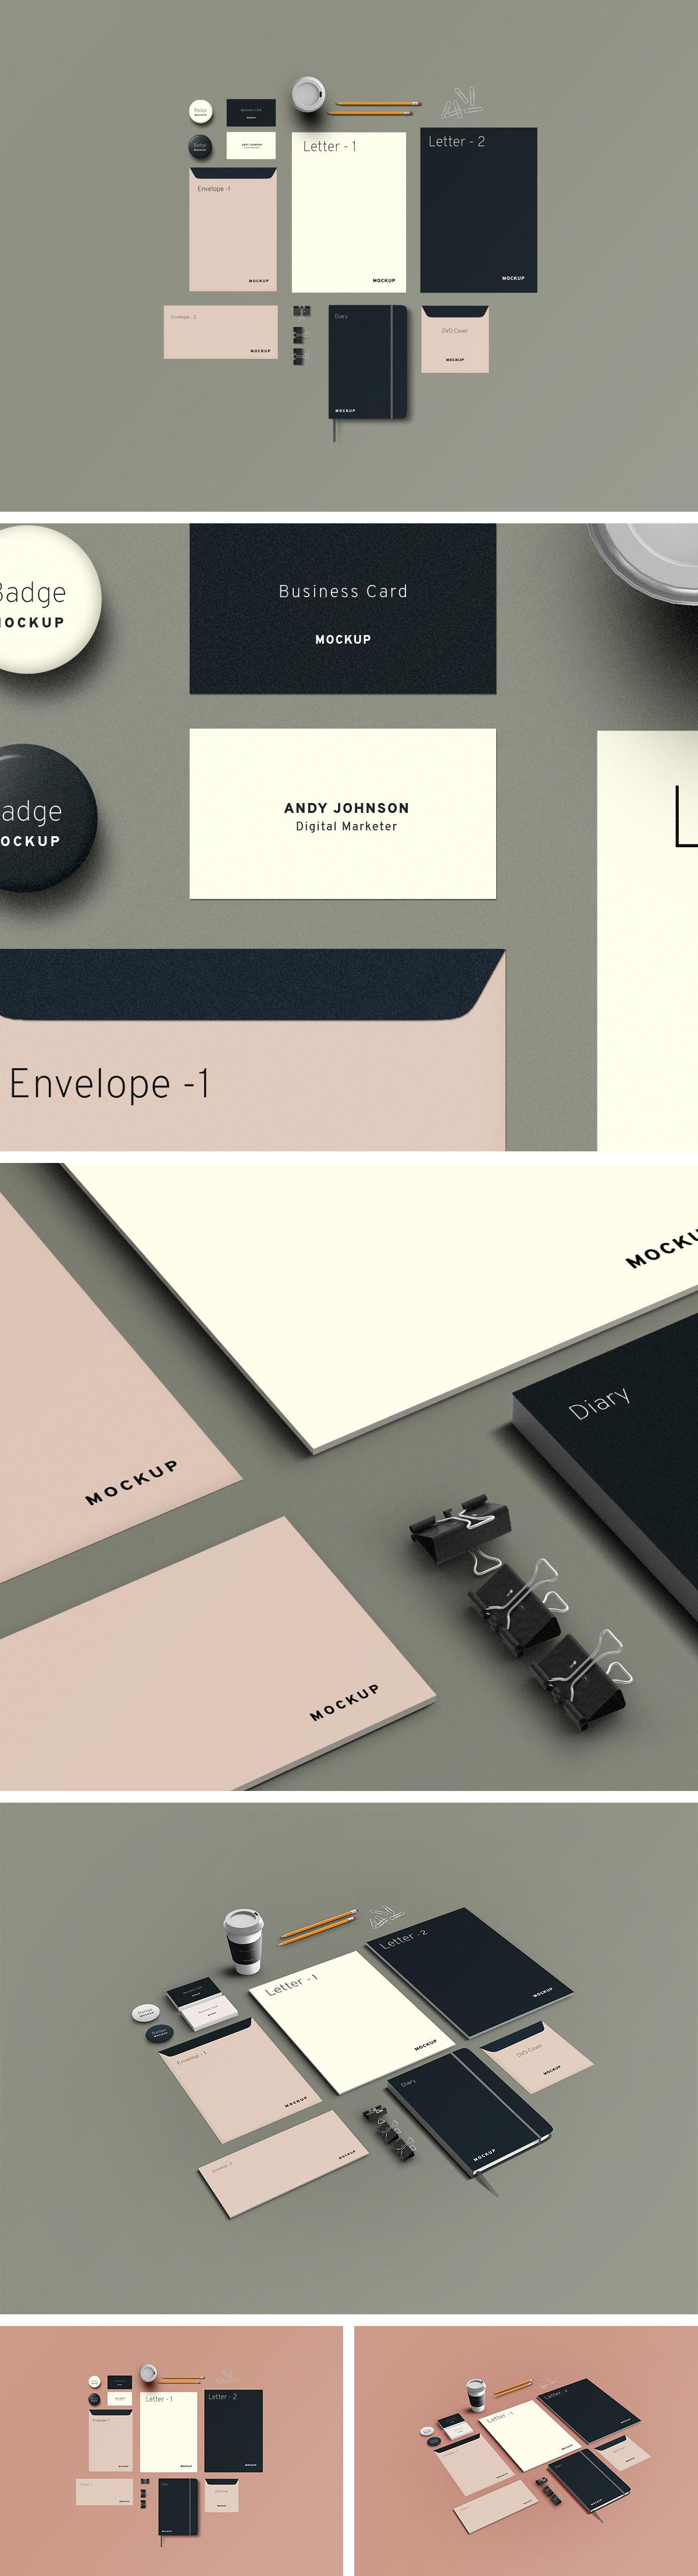 Branding Mockup PSD Elements